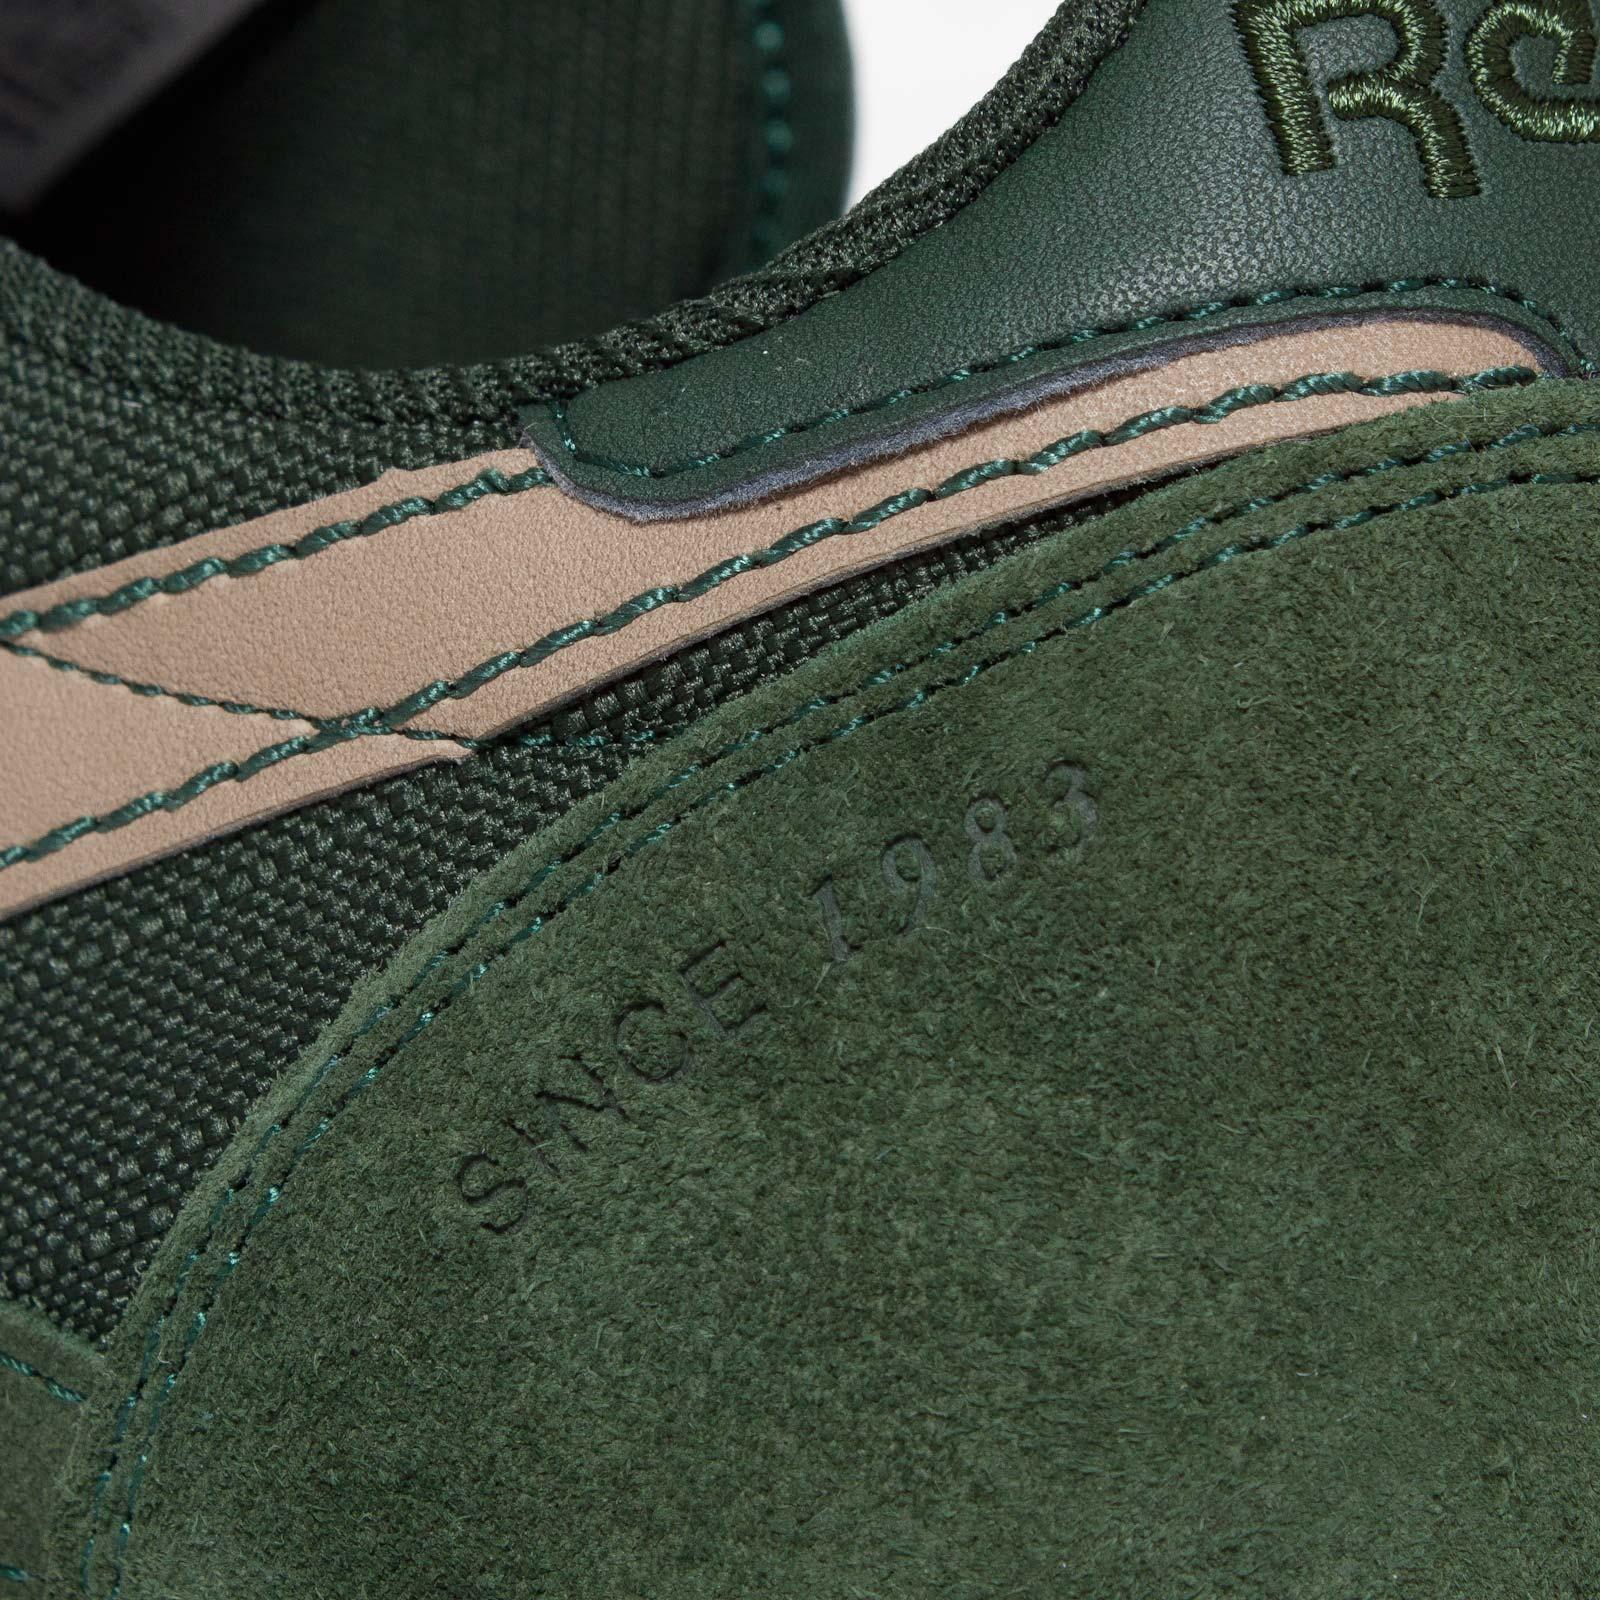 SneakersnstuffSneakers Classic Utility Reebok V47282 Leather dxCBero